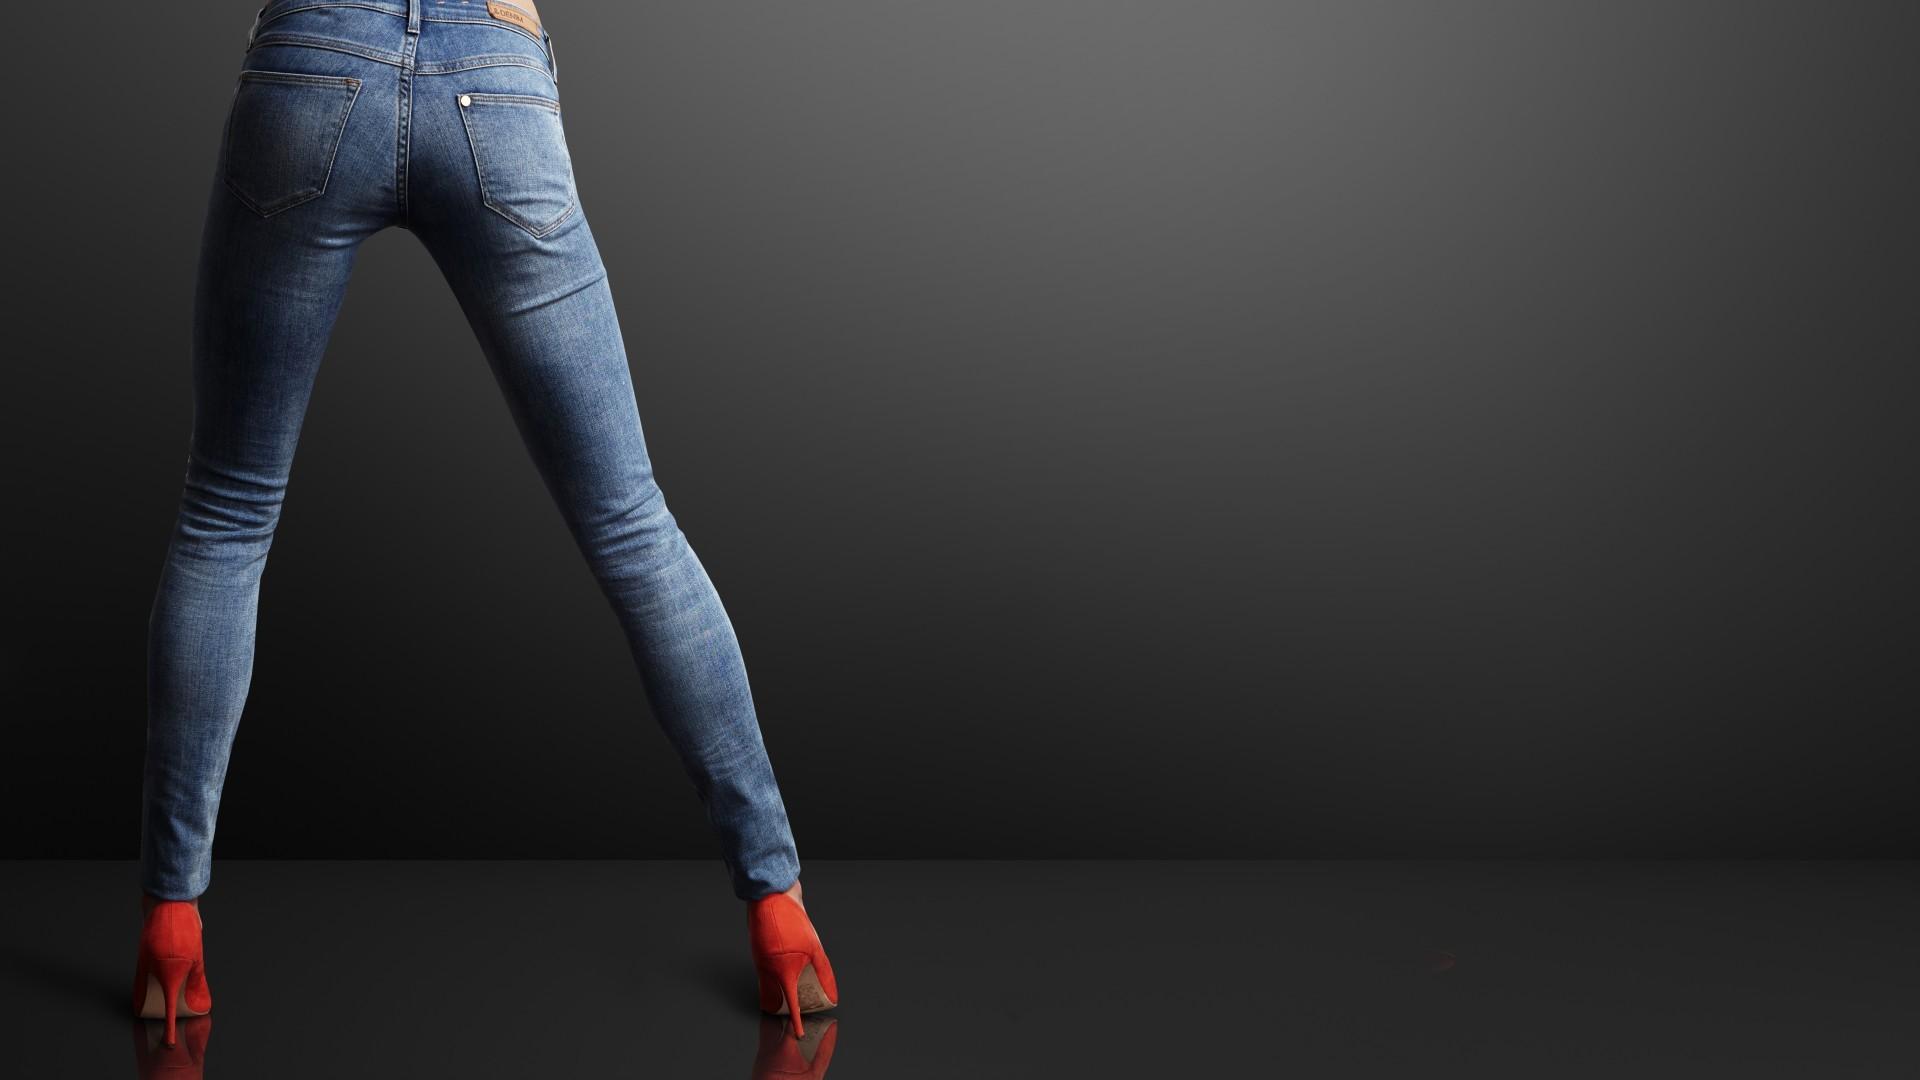 Women Legs Jeans Denim Clothing Pocket Zipper Leg Arm Textile Abdomen Human Body Trousers